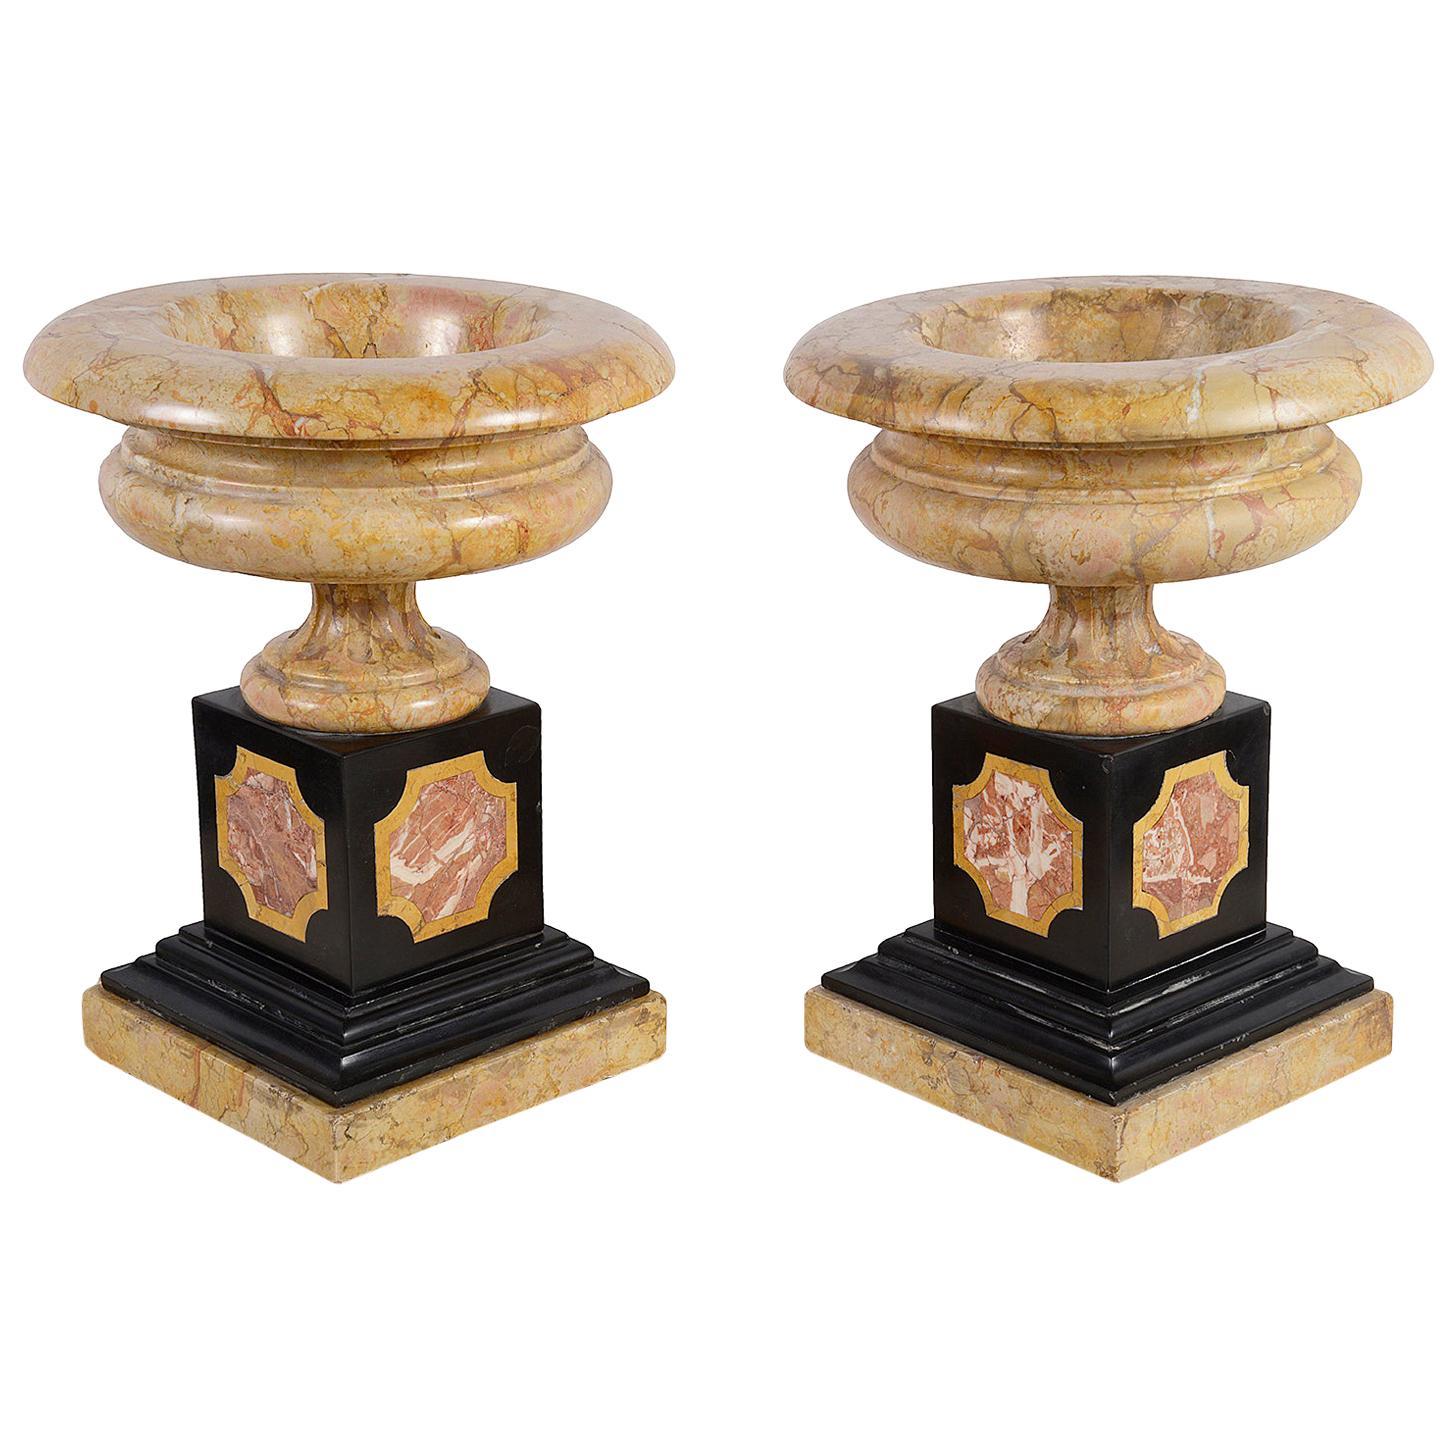 Pair of 19th Century Grand Tour Sienna Marble Tazzas